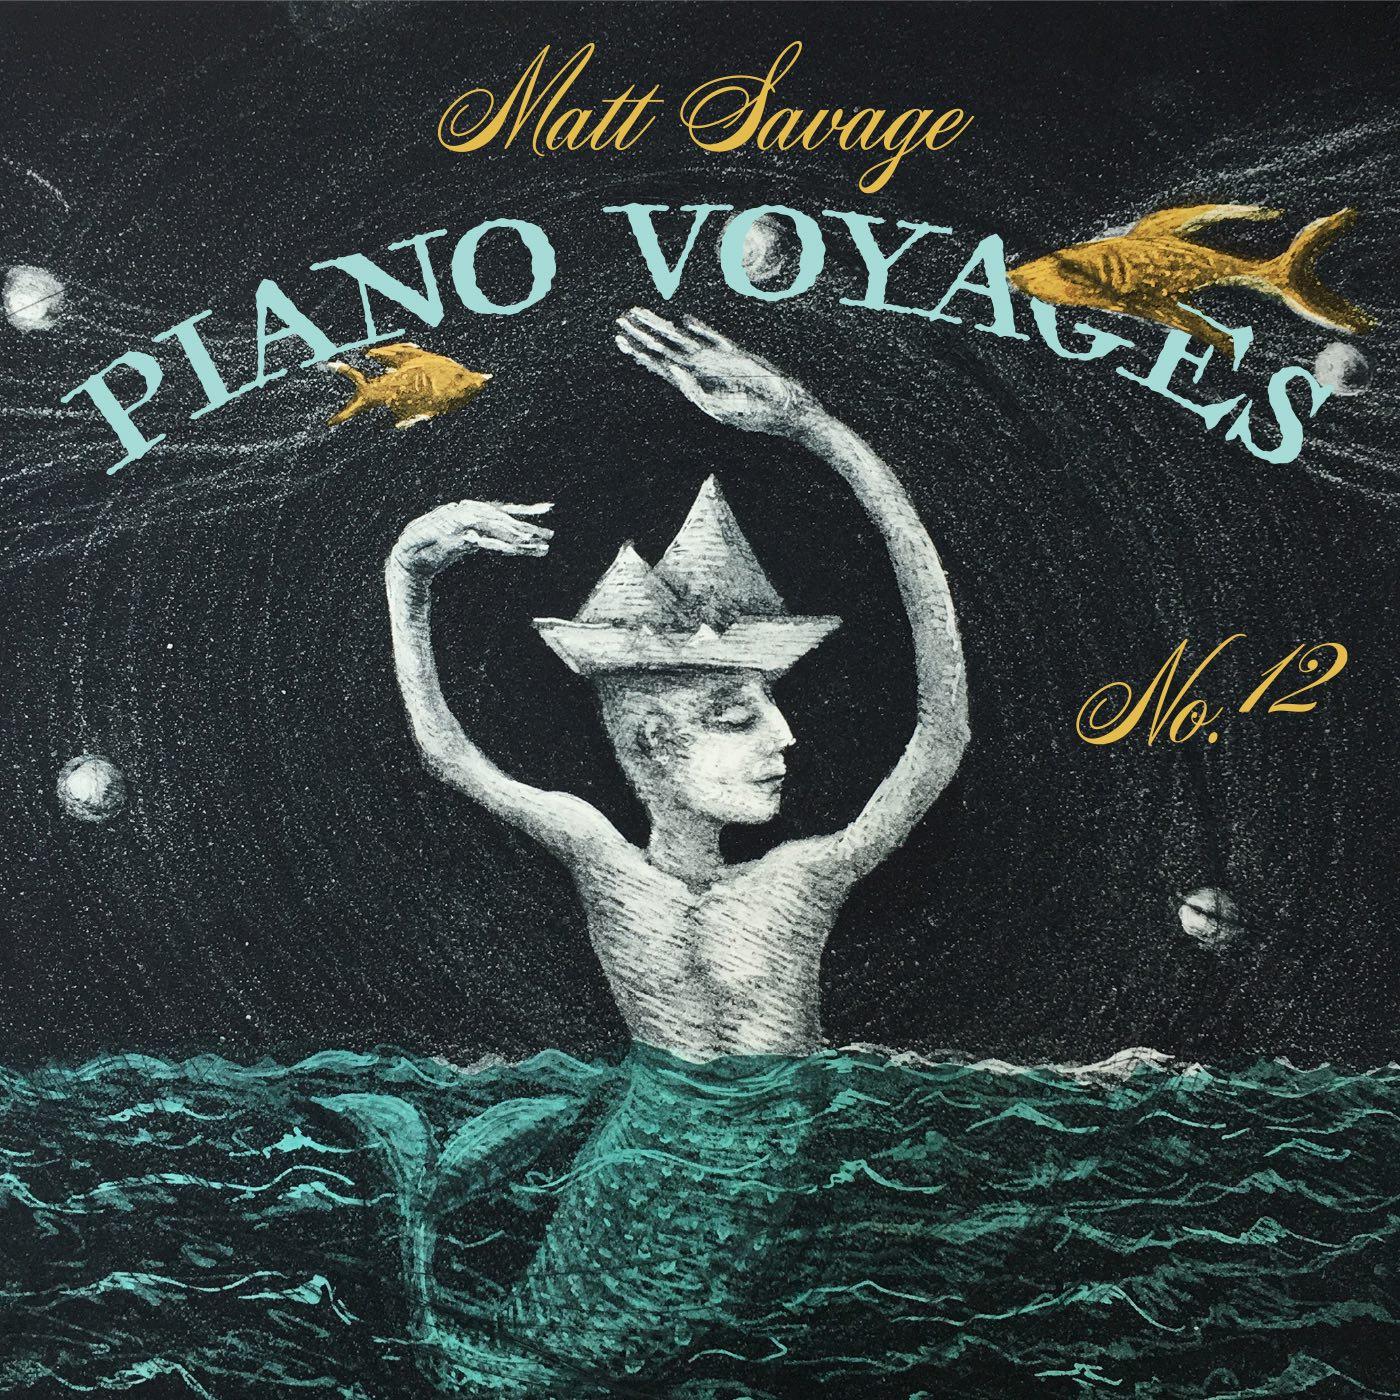 Piano Voyages Album Art HiRes